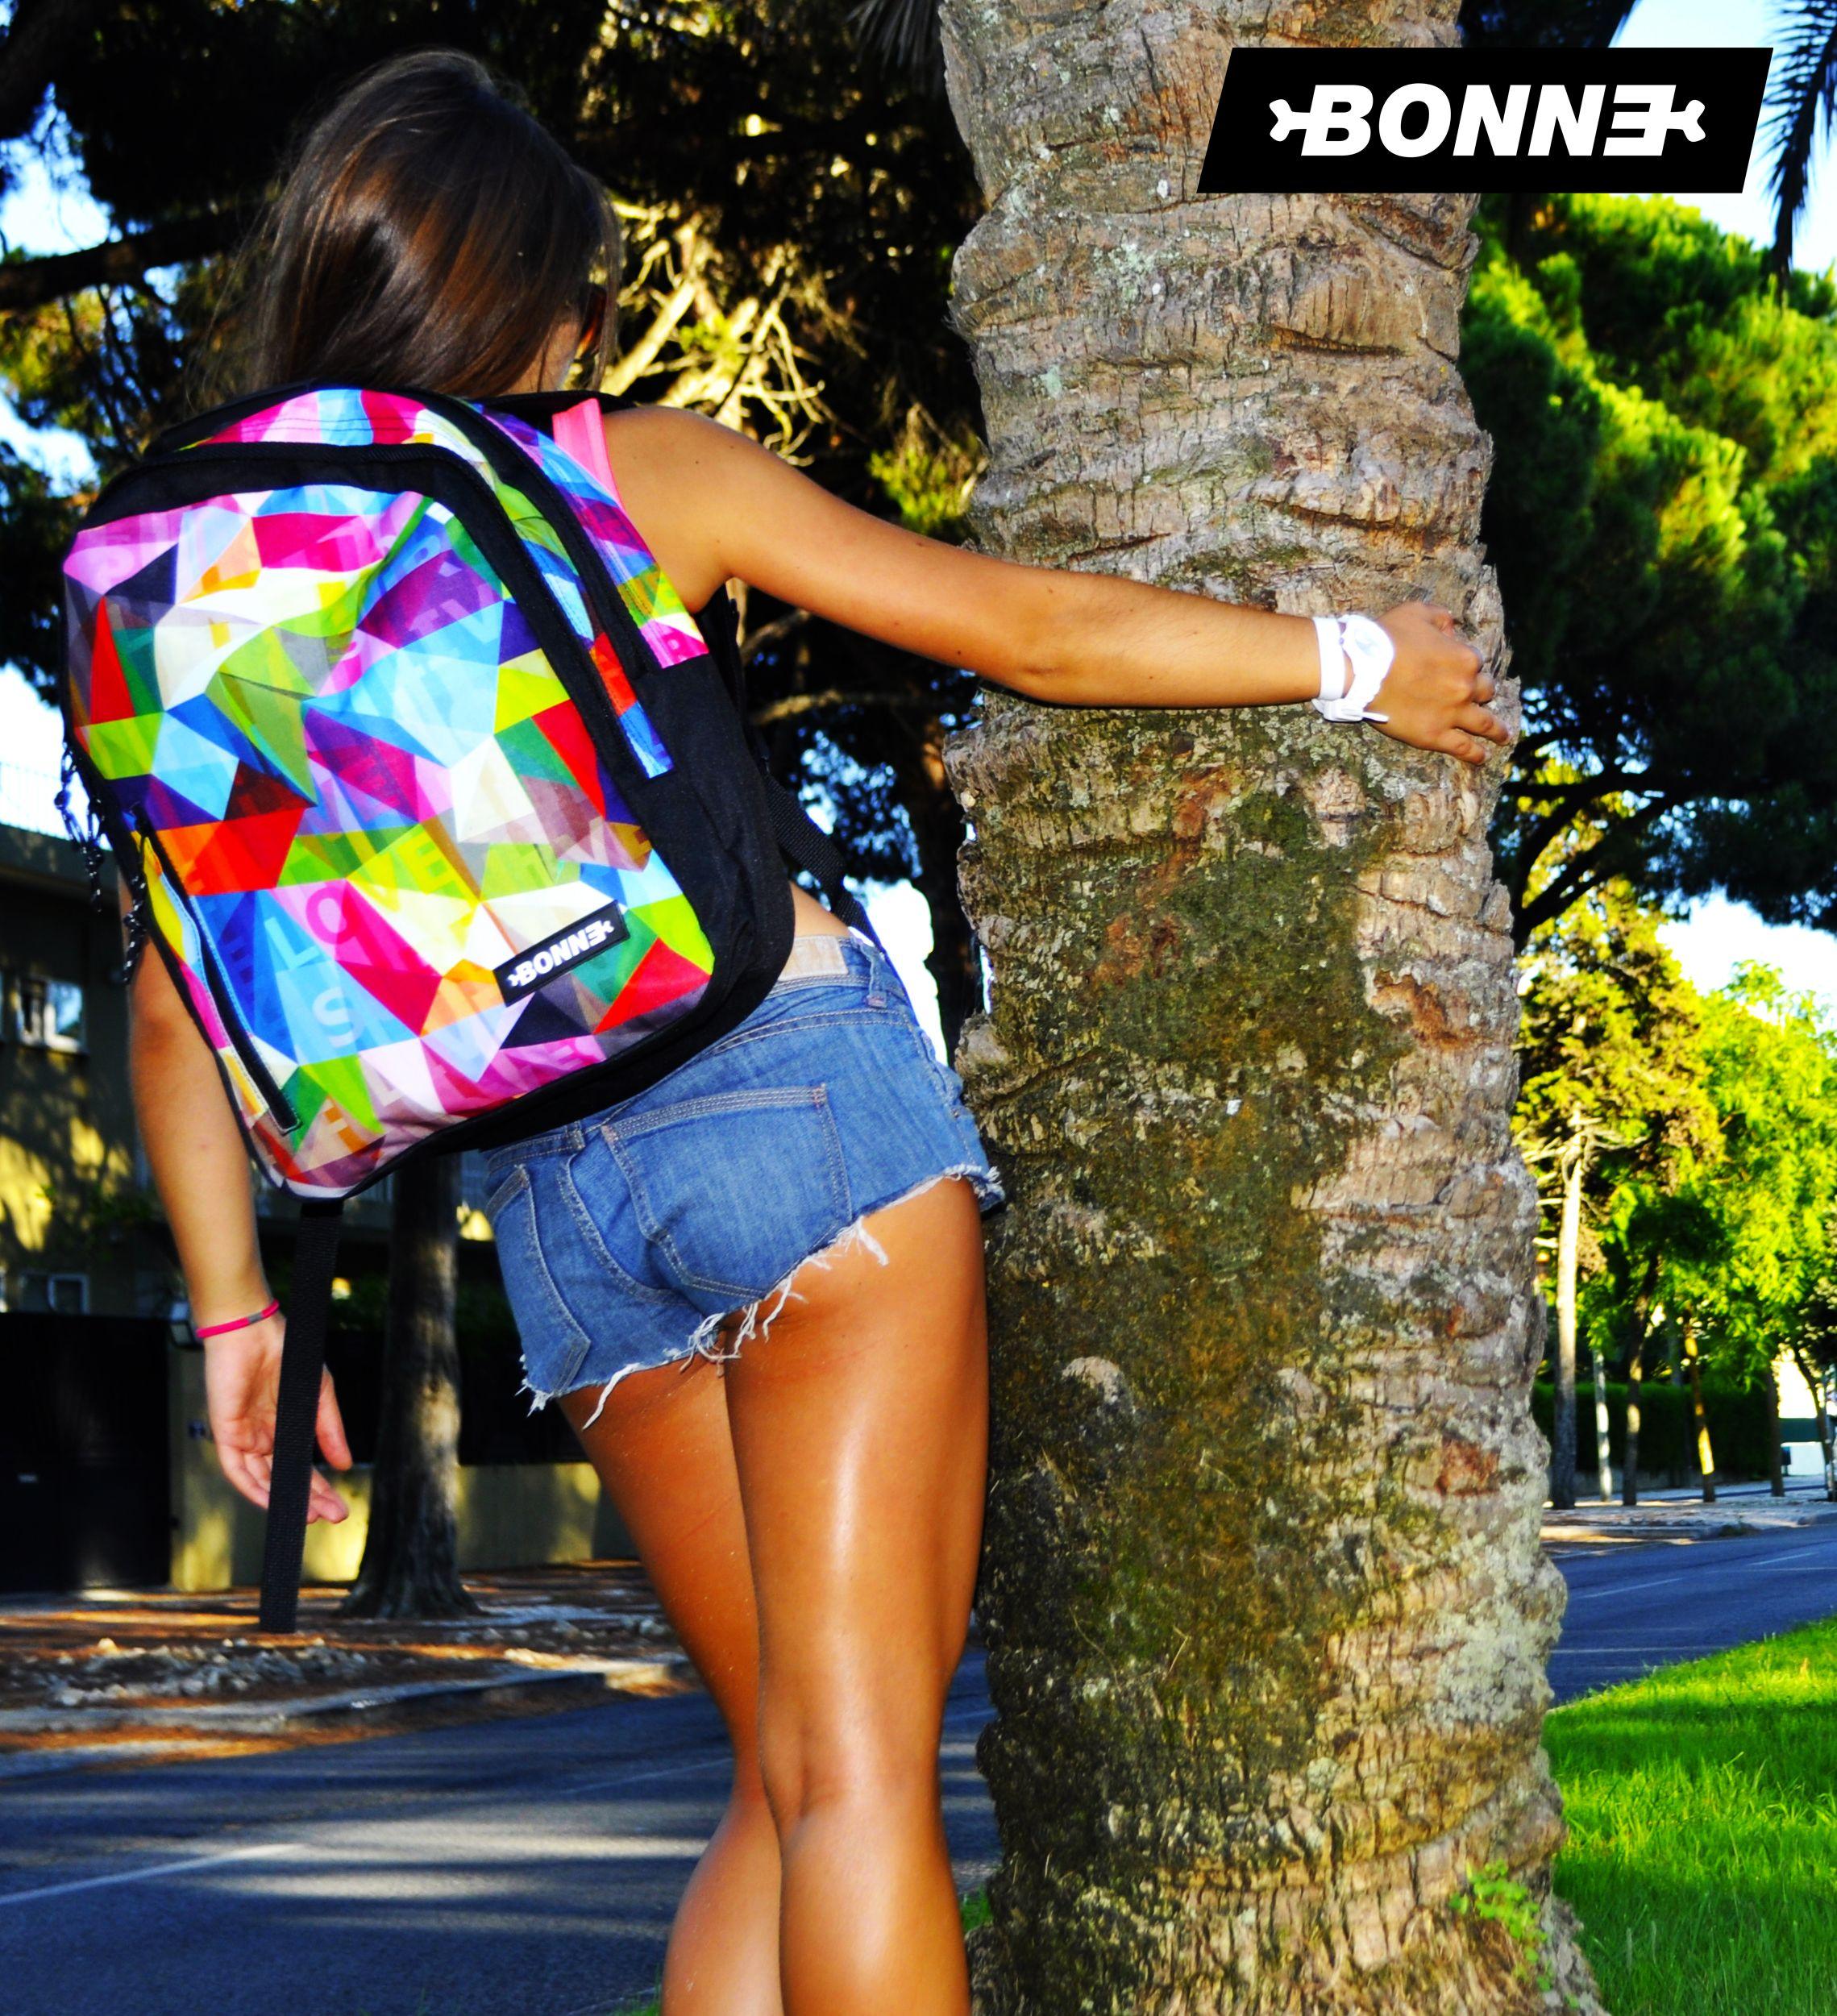 Bonne Bags